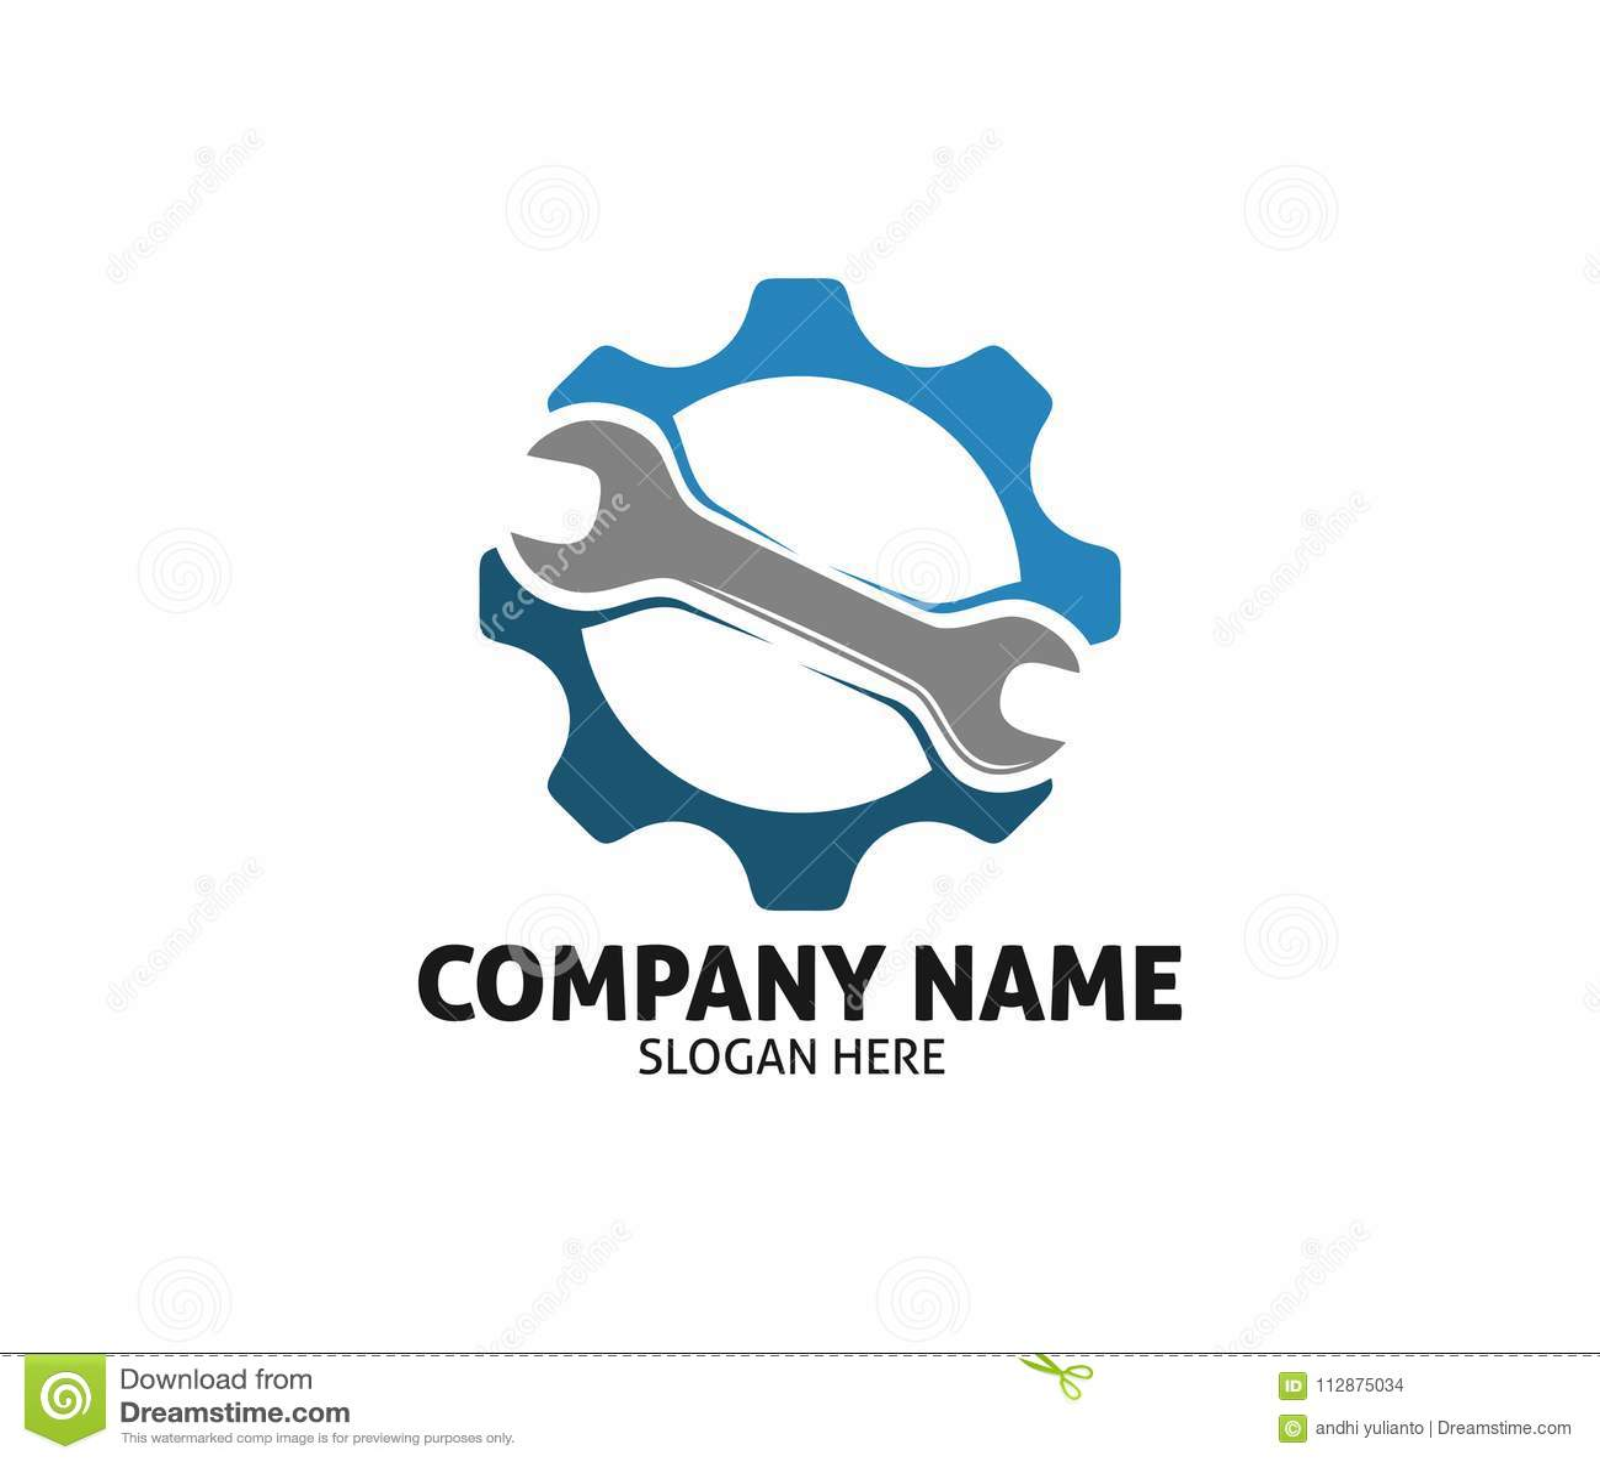 Car Auto Care Dealer Repair Service Vector Logo Design Stock